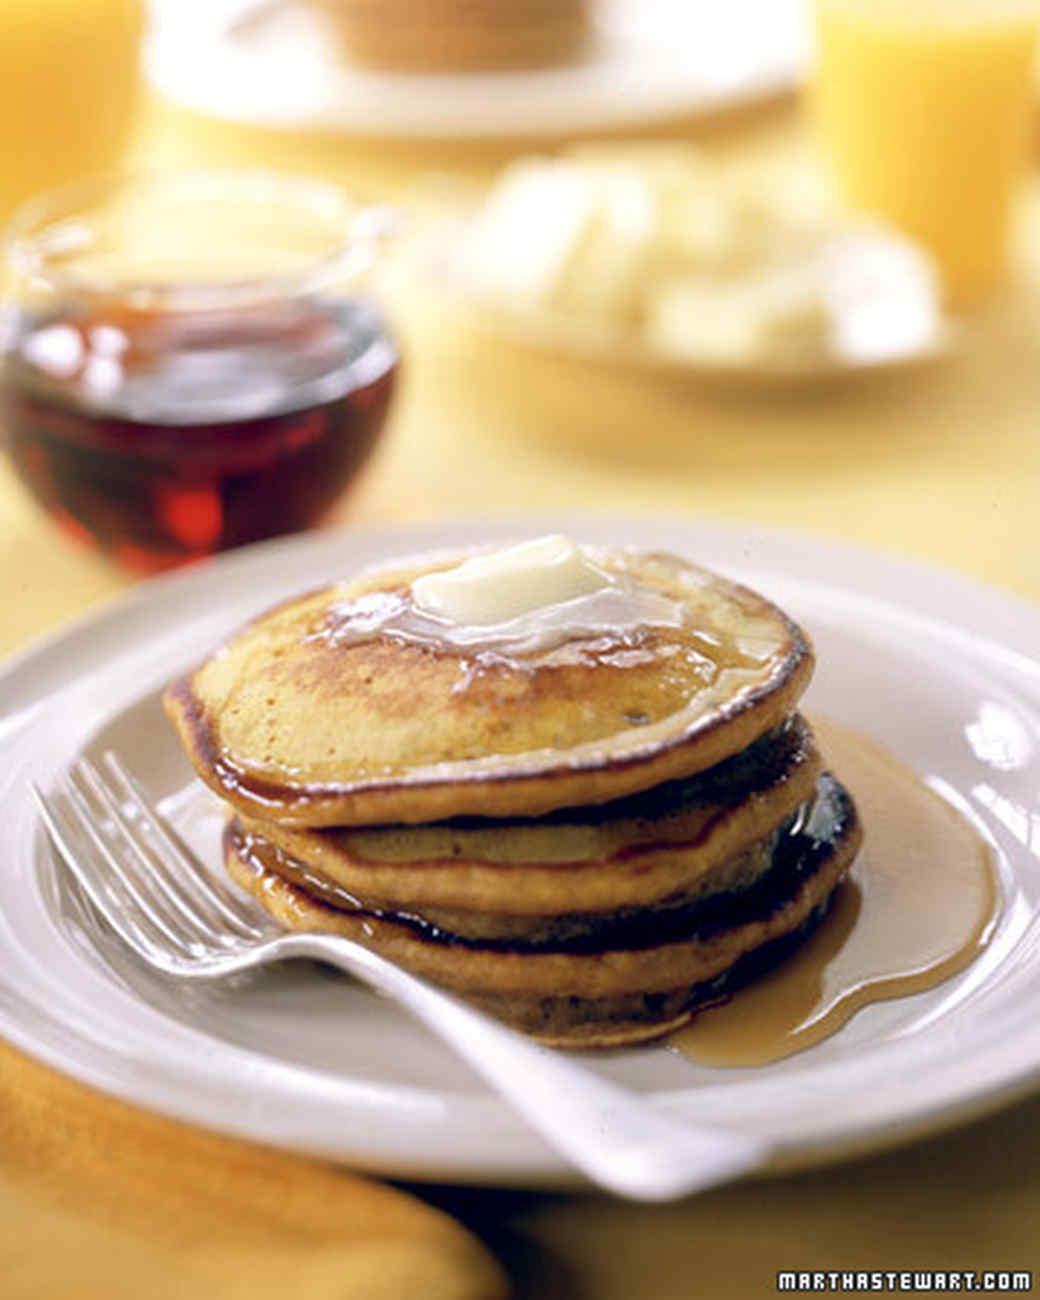 msl_oct06_15yr_pancakes.jpg